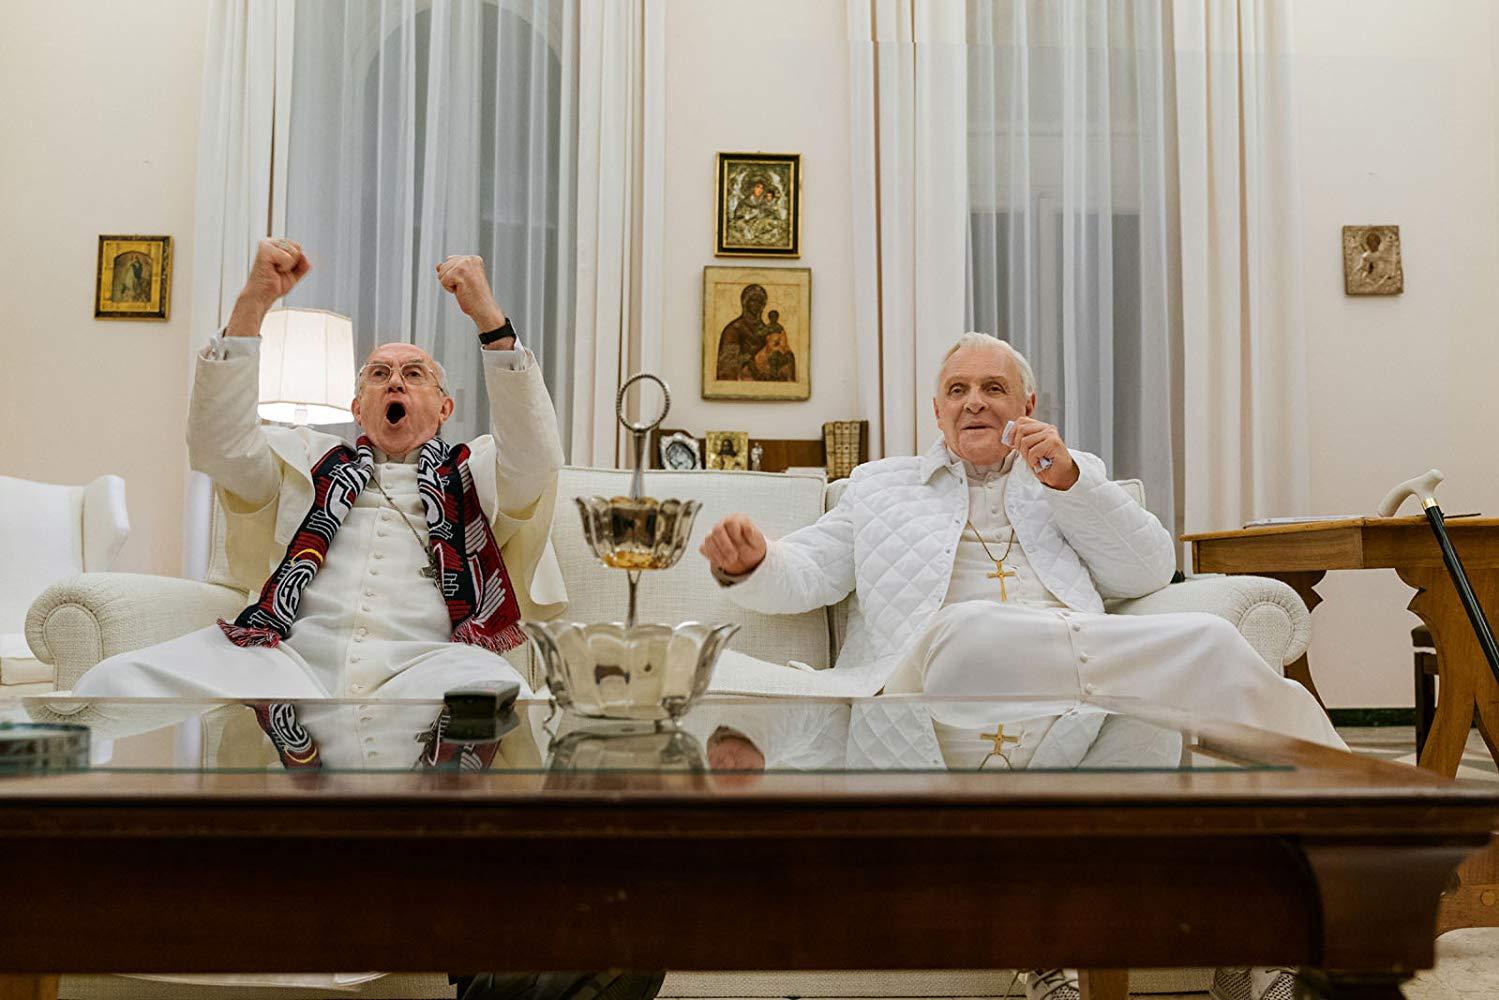 web2-the-two-popes-actors-2-imdb.jpg